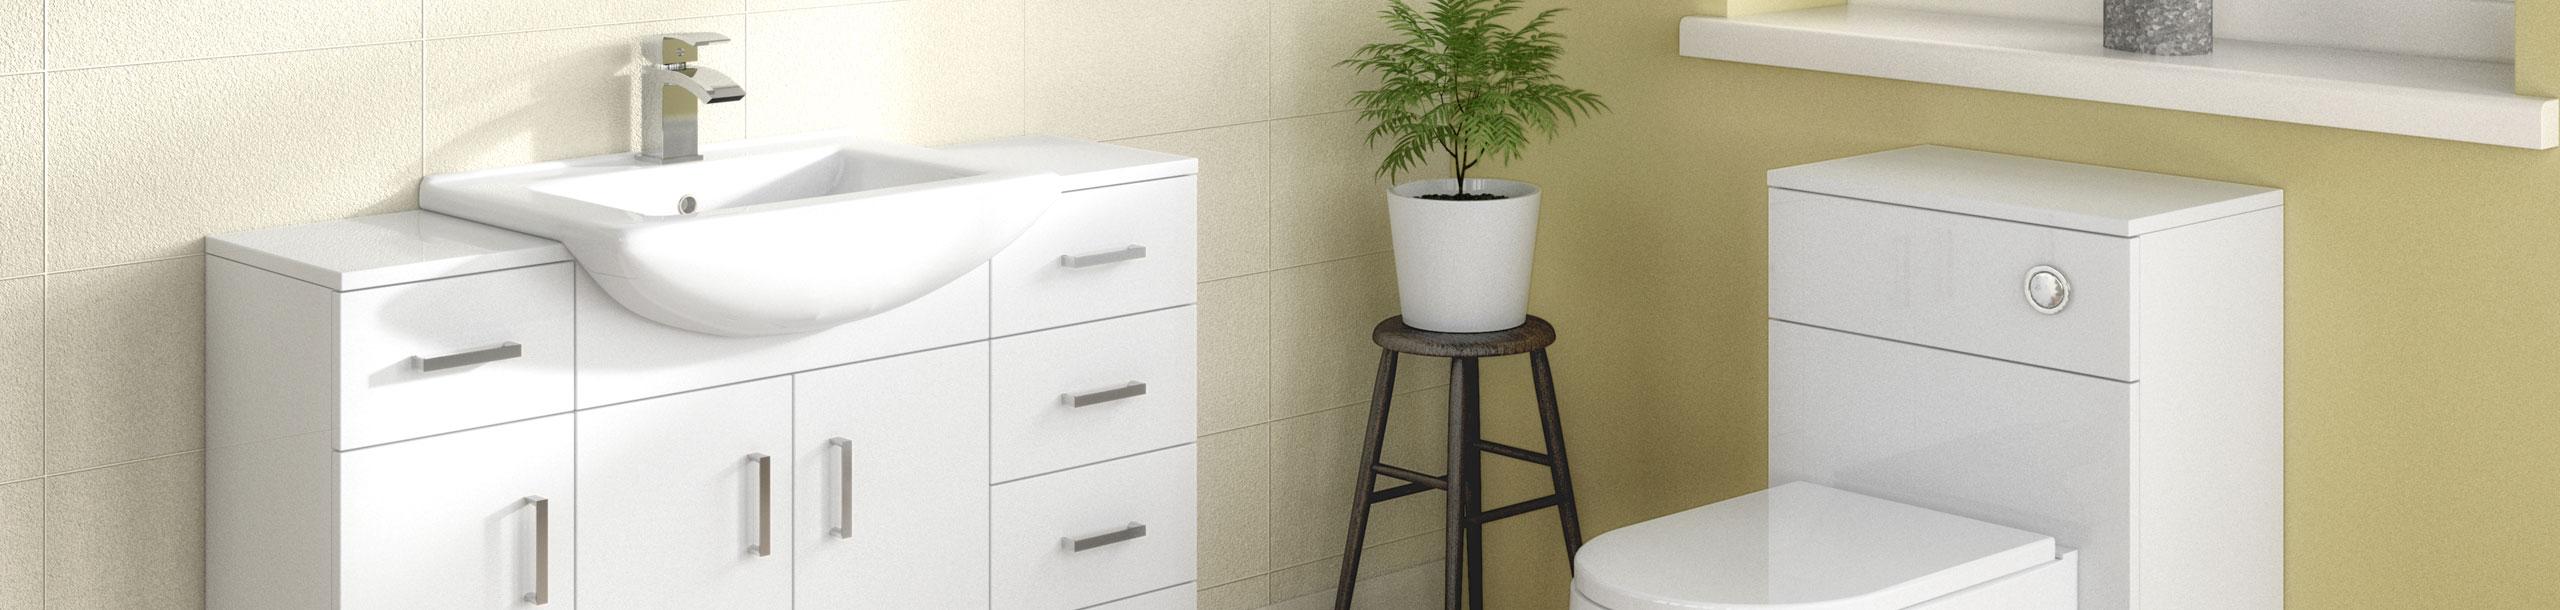 High Gloss White Furniture